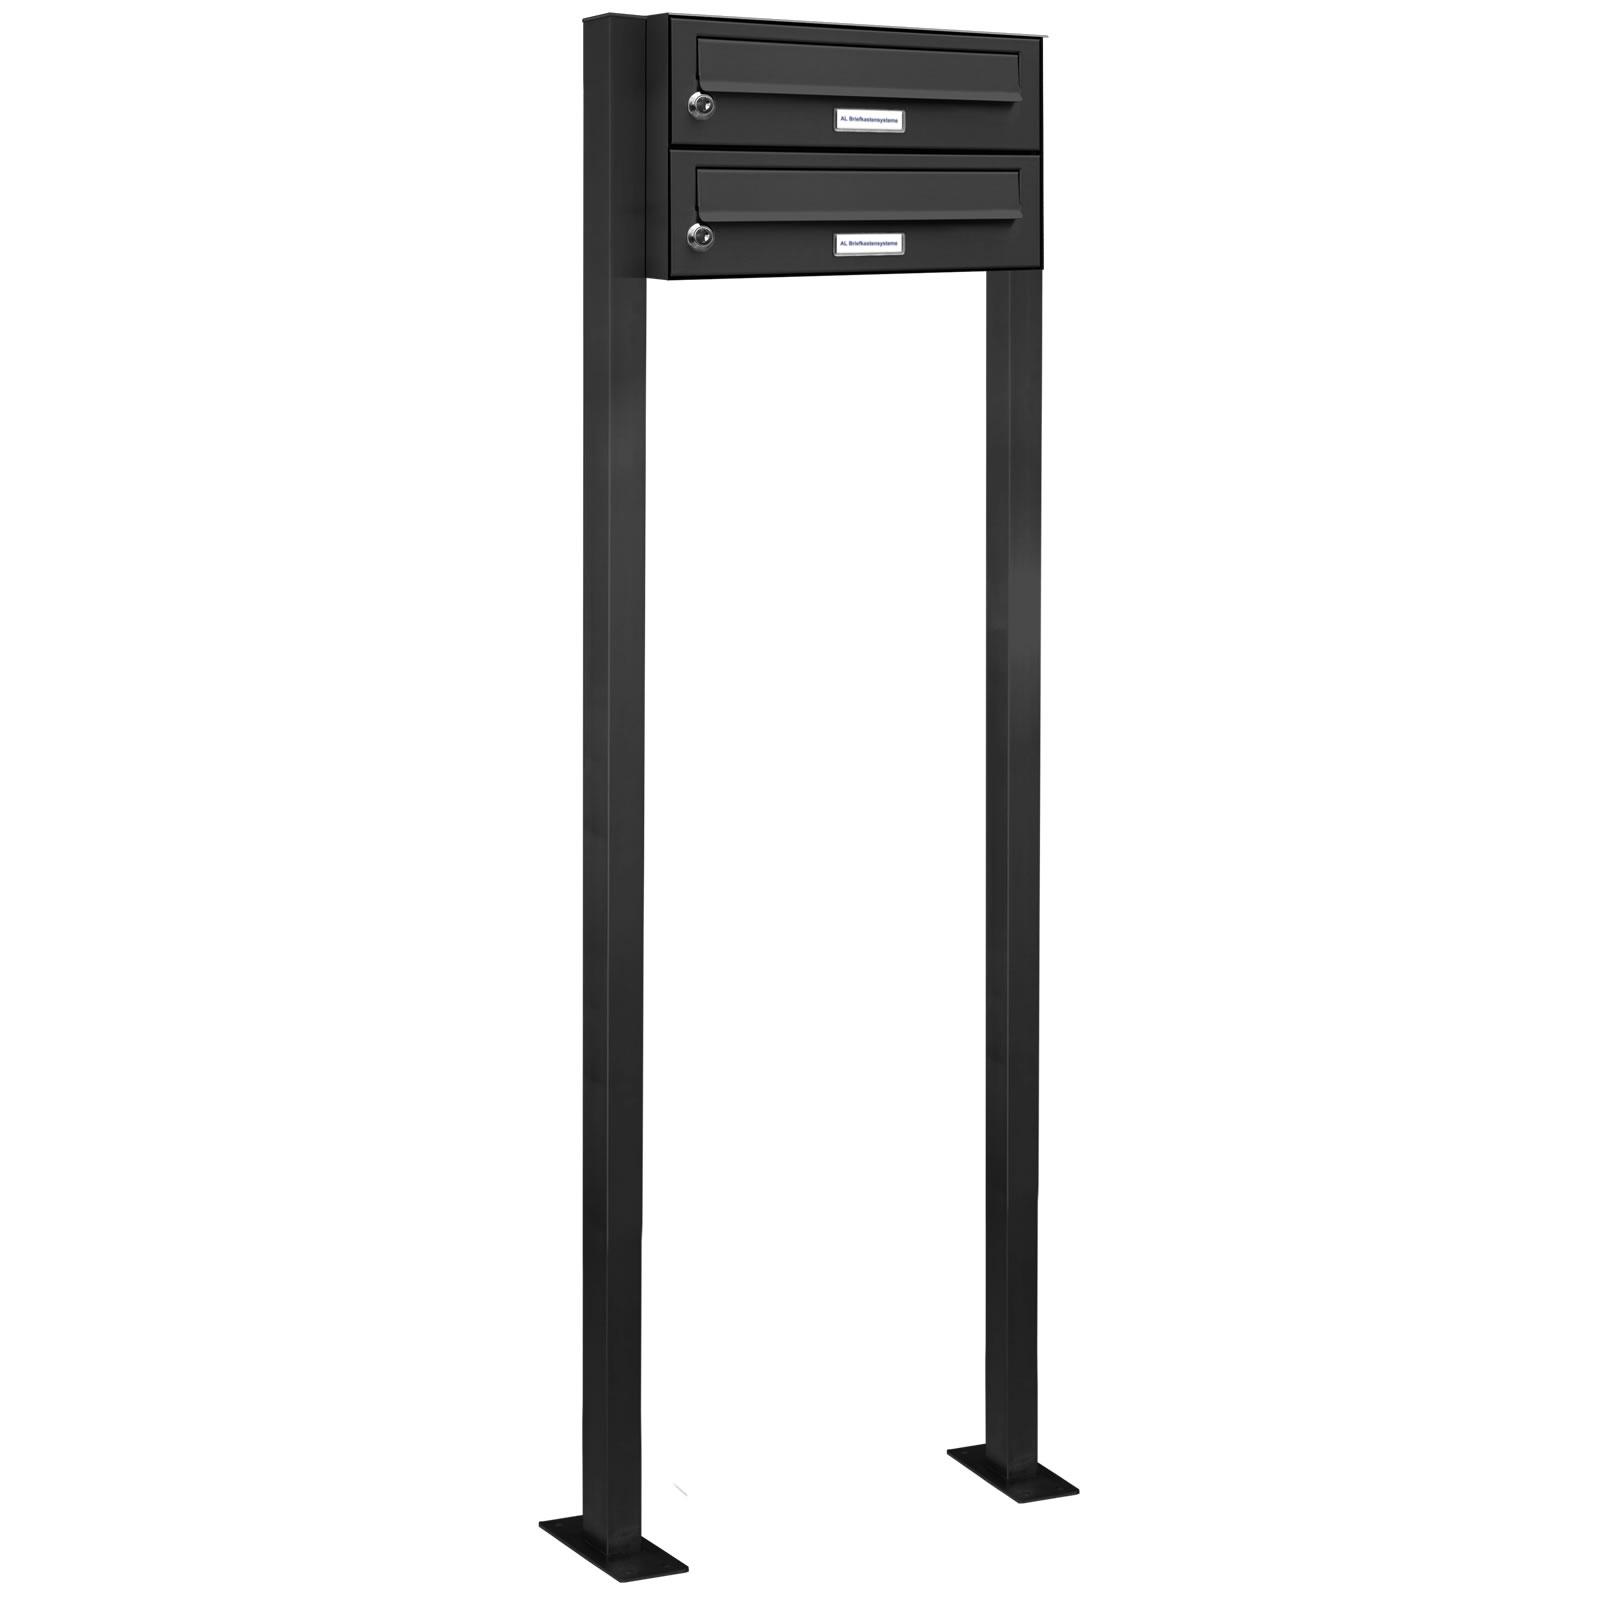 2er standbriefkasten anlage freistehend ral 7016. Black Bedroom Furniture Sets. Home Design Ideas